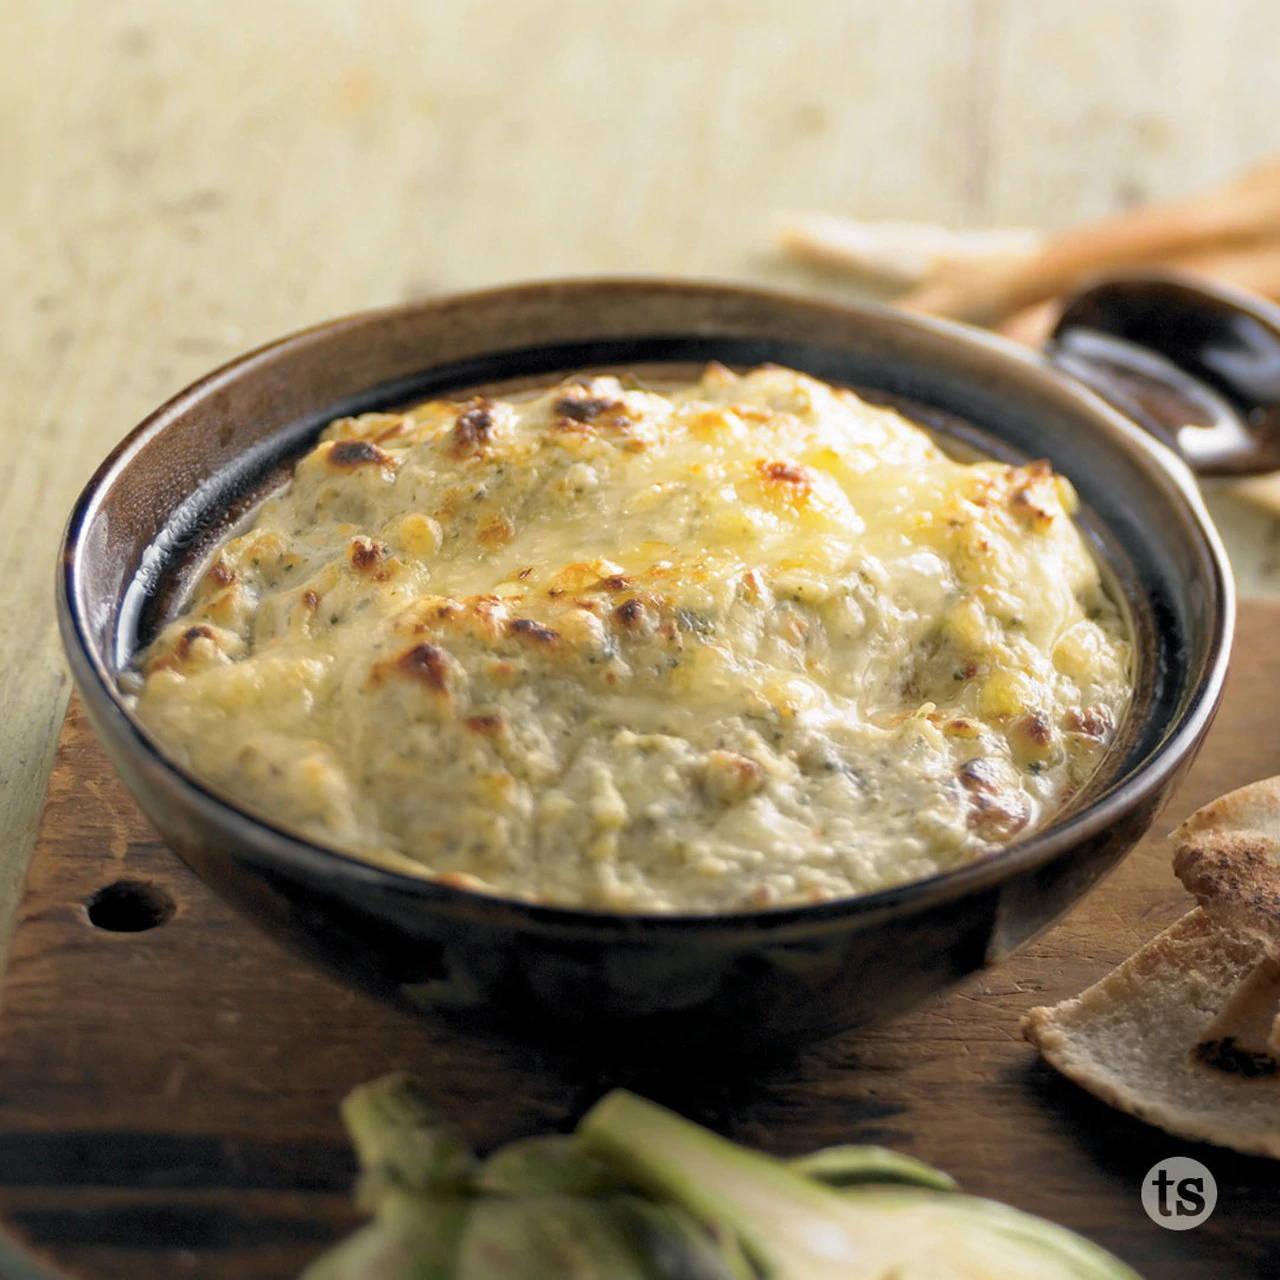 artichoke & spinach warm dip mix